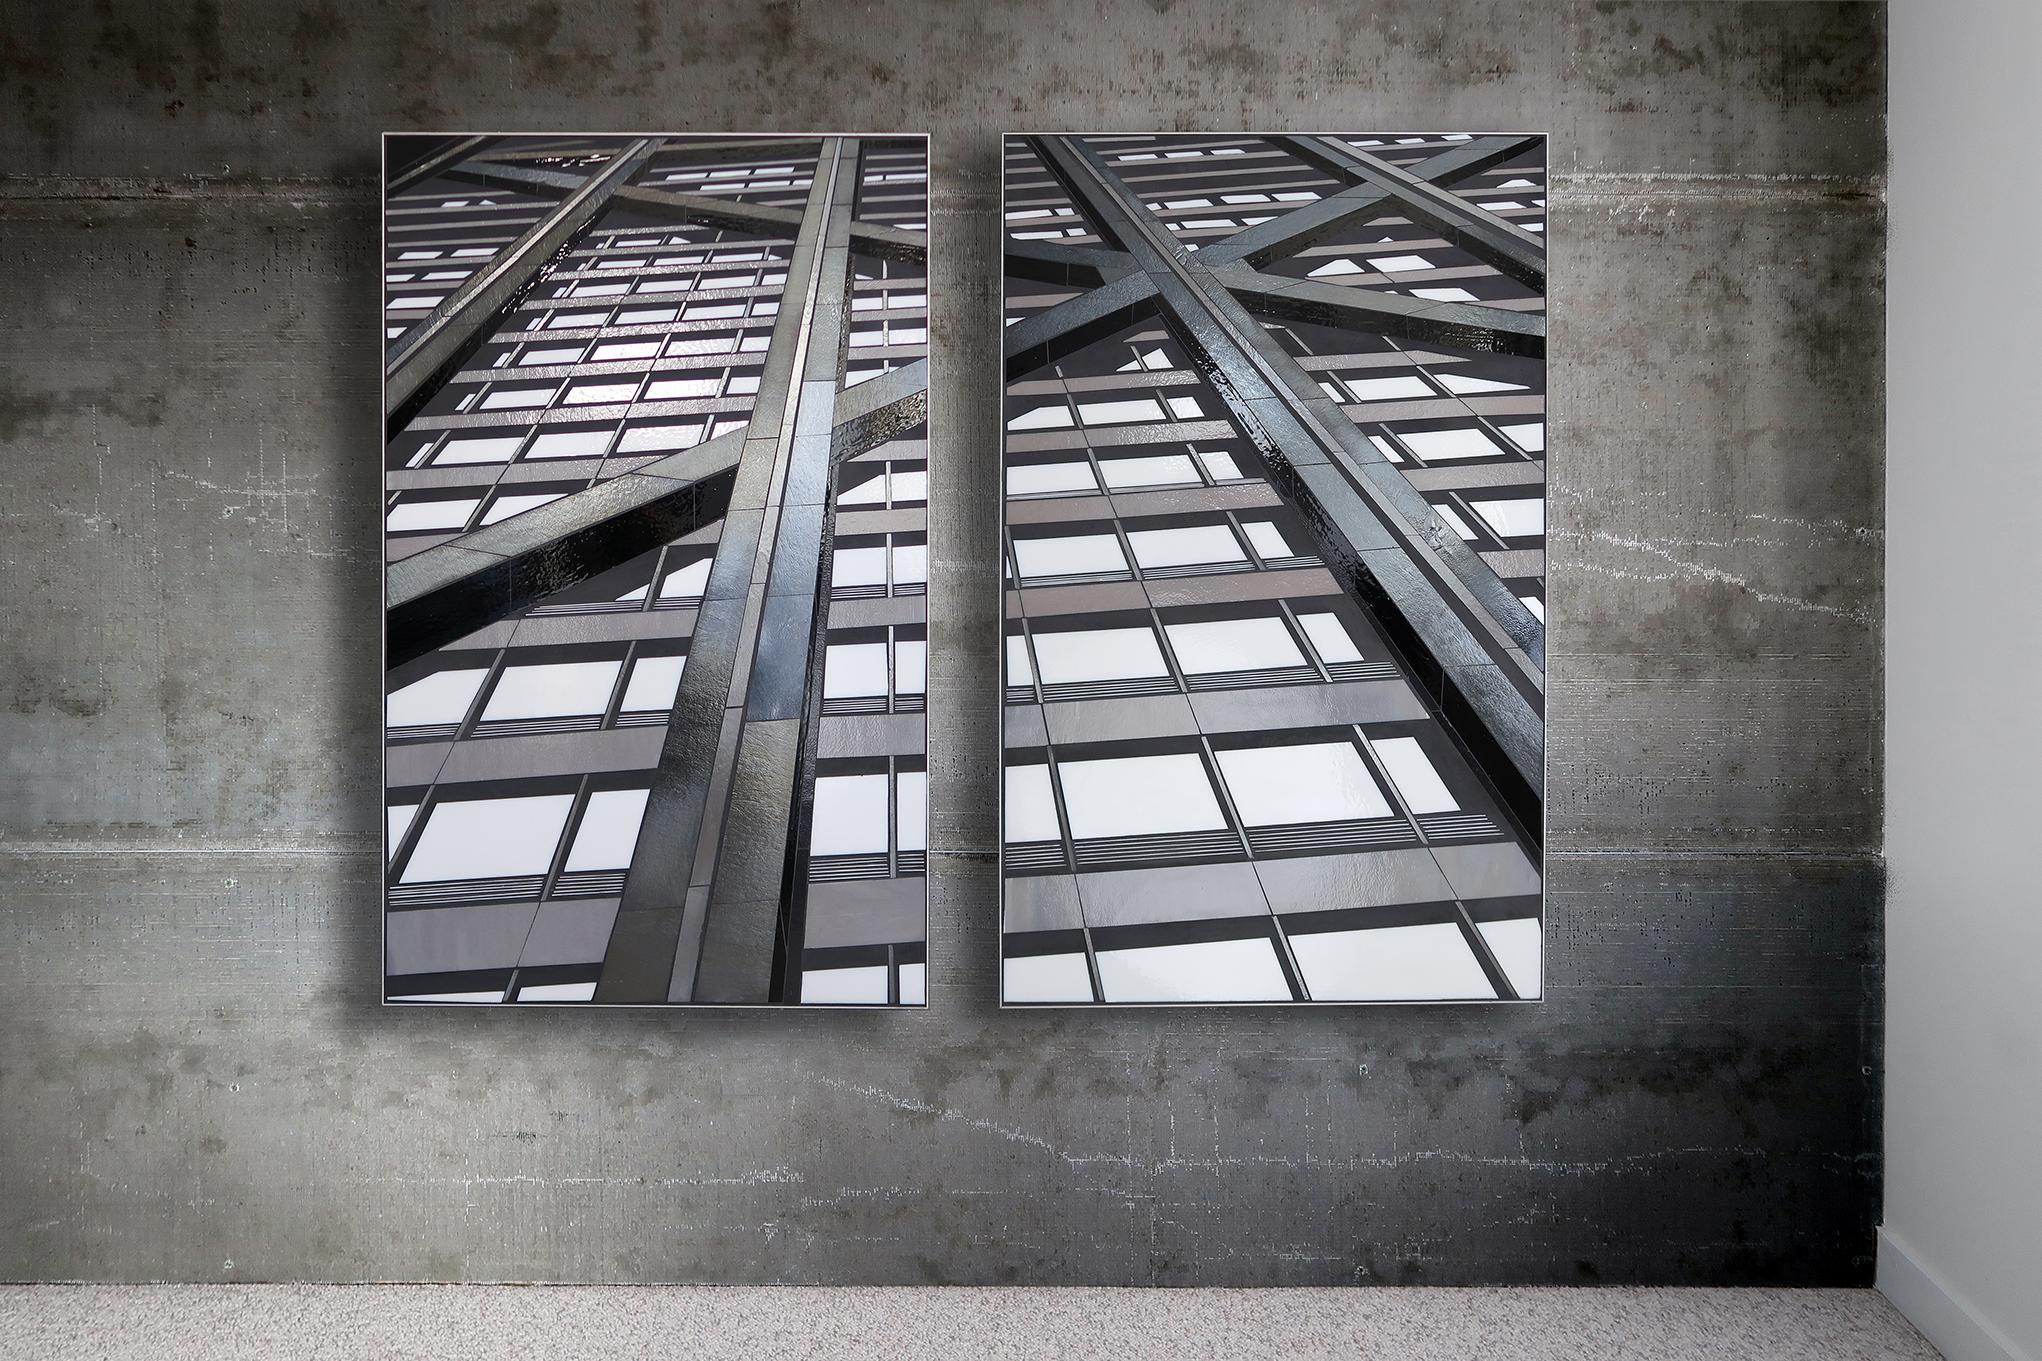 "Reflect 3.4a+b Hancock each 30"" x 48"" glass c Heather Hancock 2018"